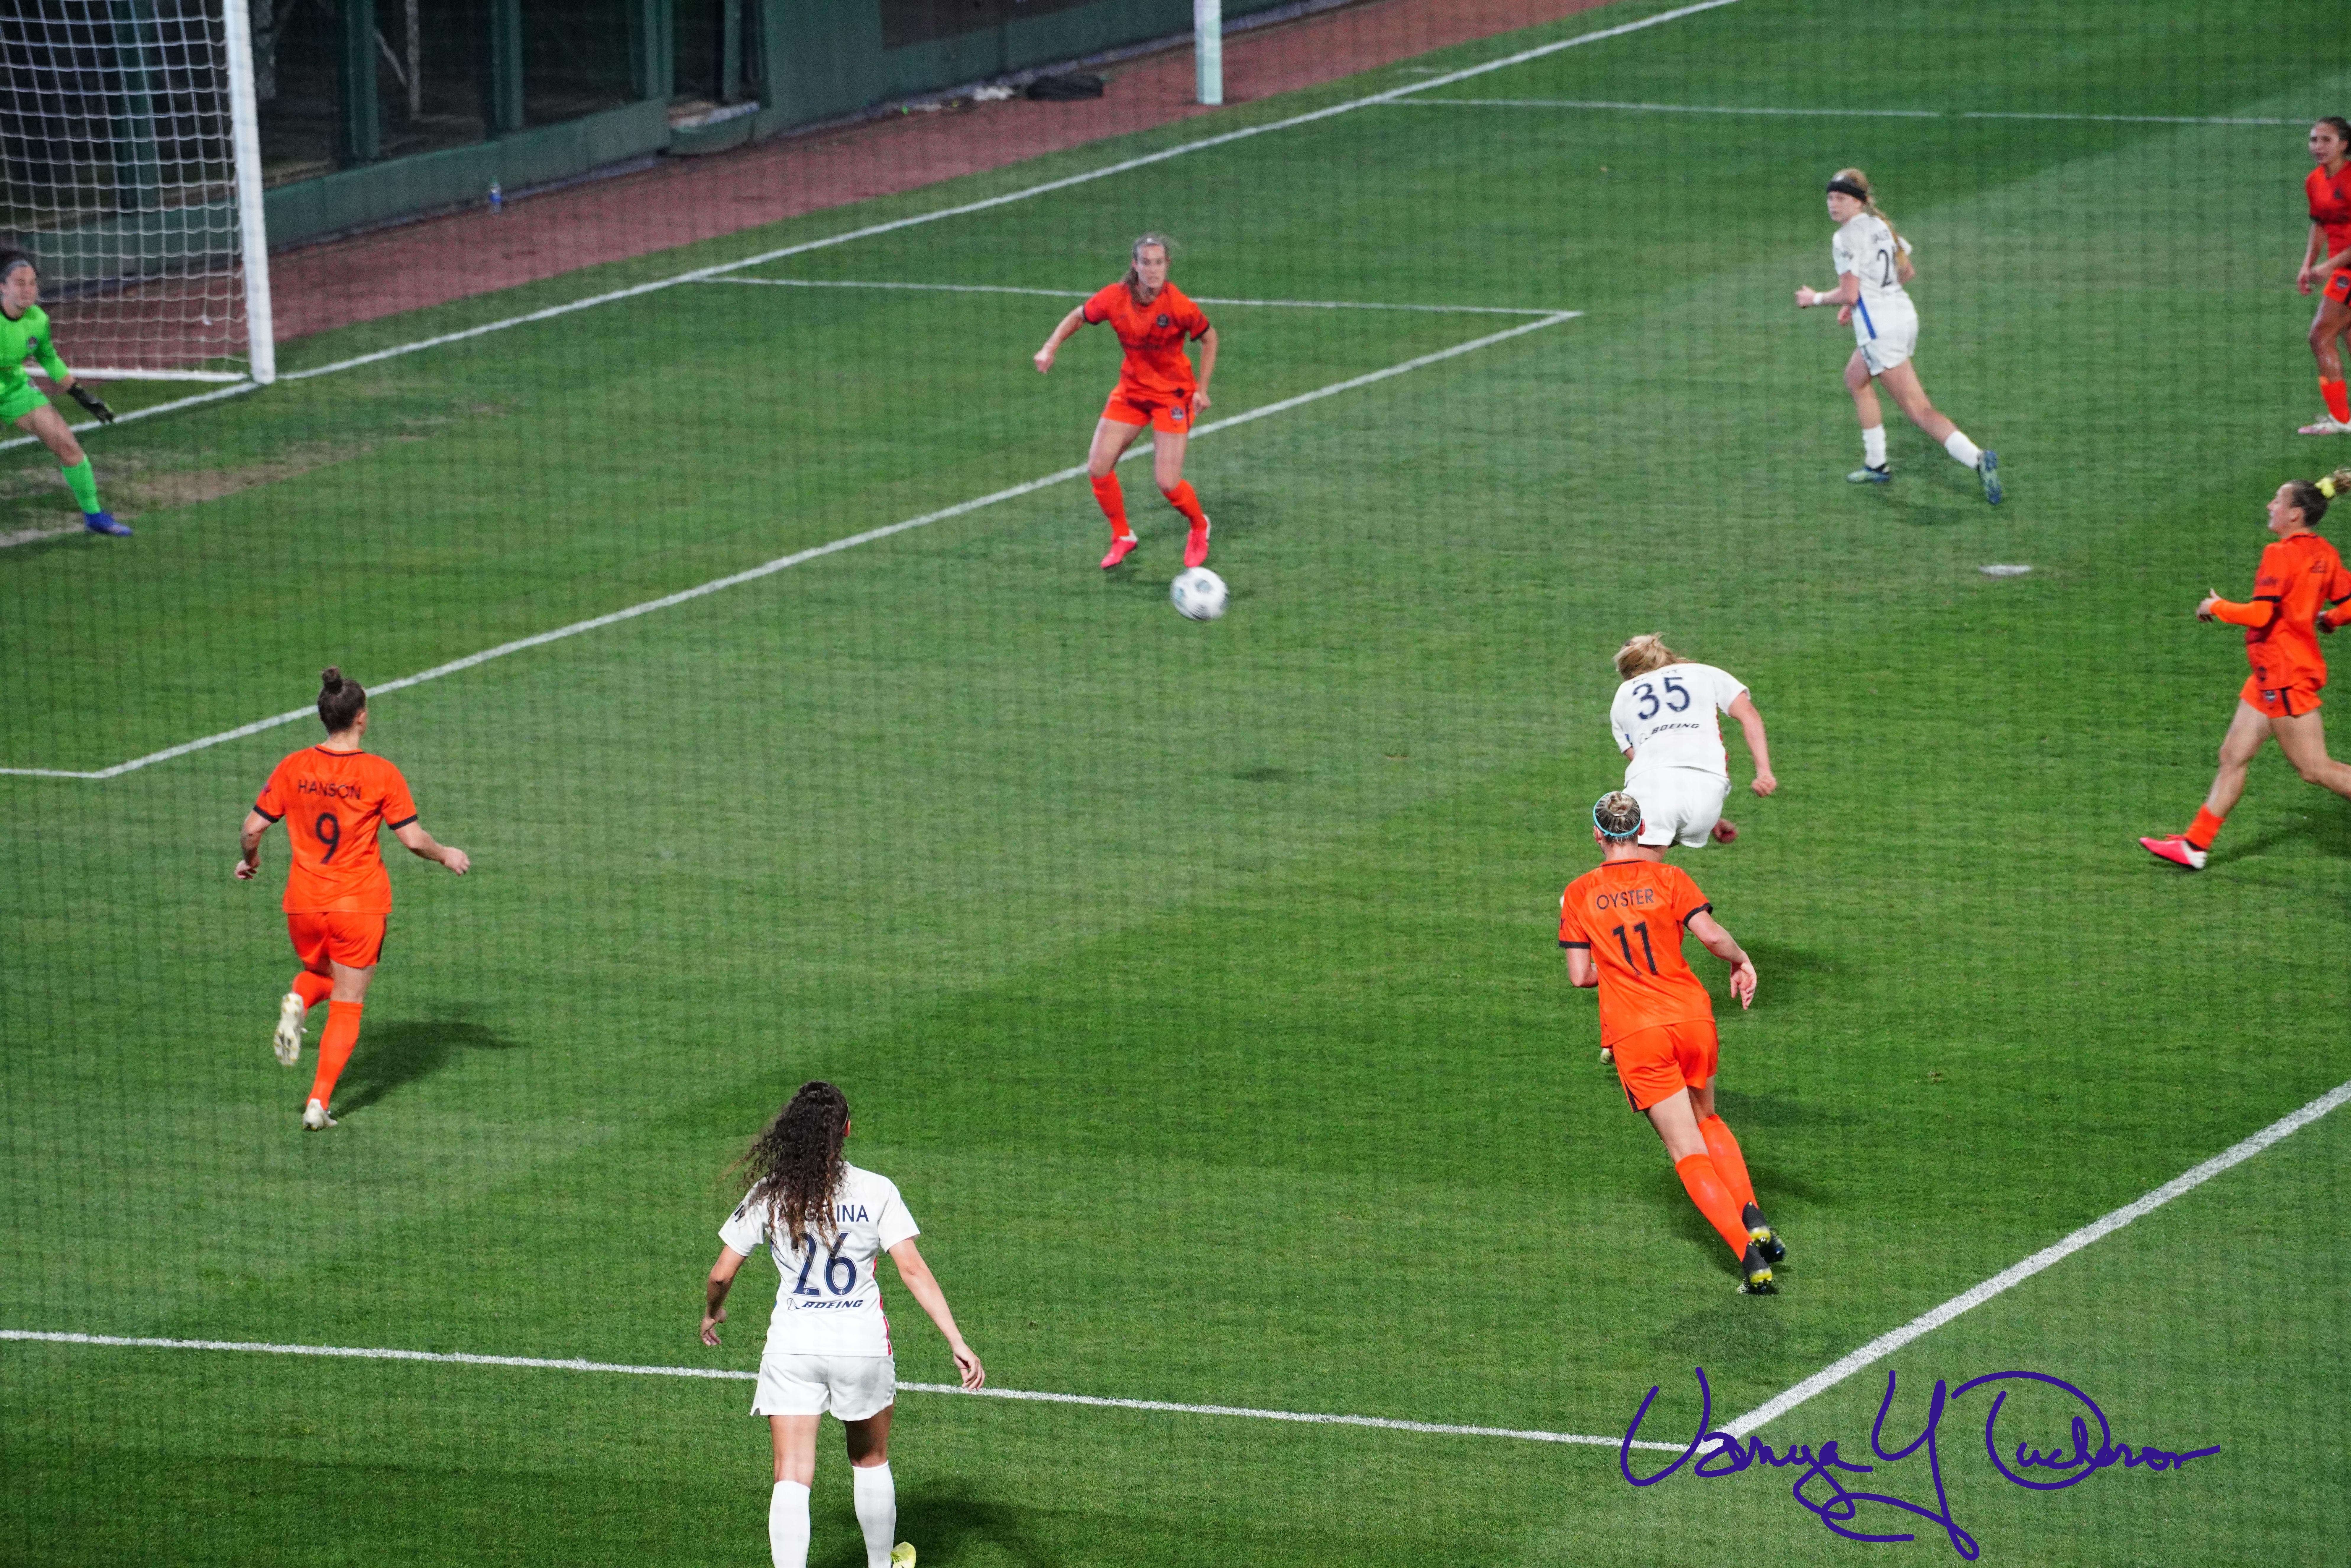 Leah Pruitt takes a drive at goal